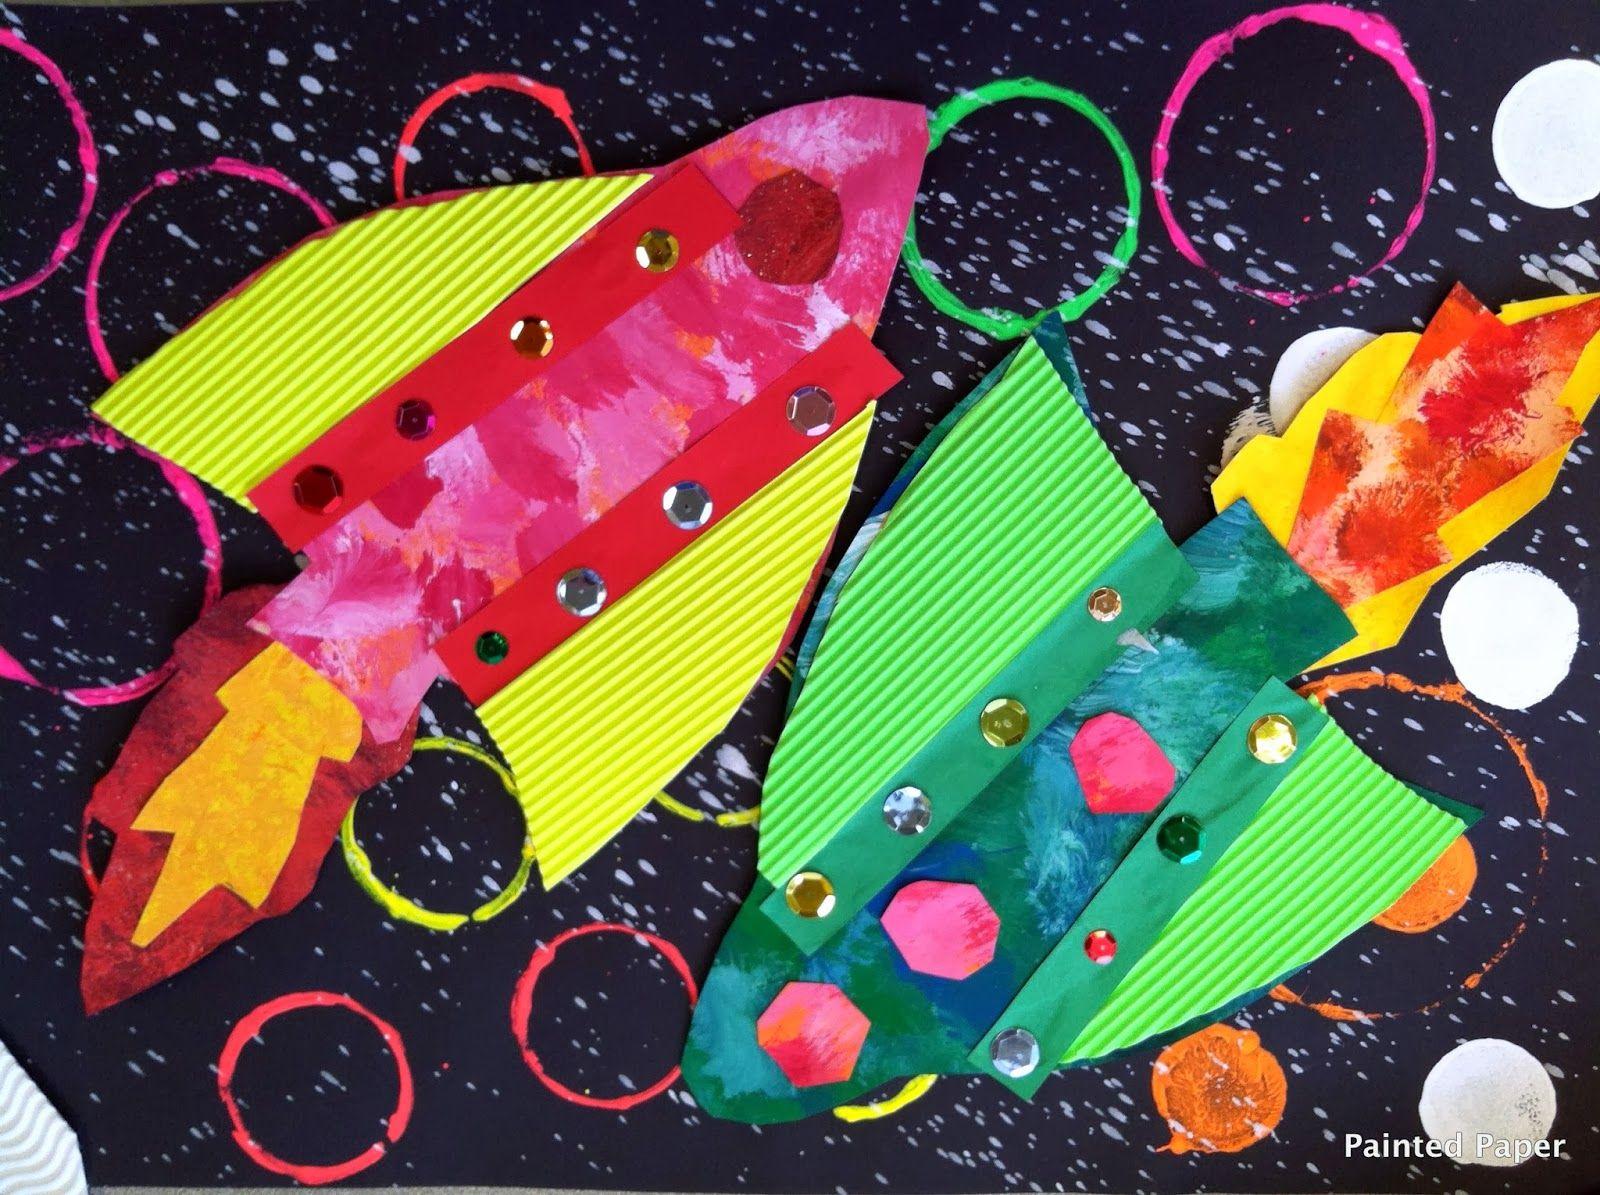 Painted Paper Retro Rockets